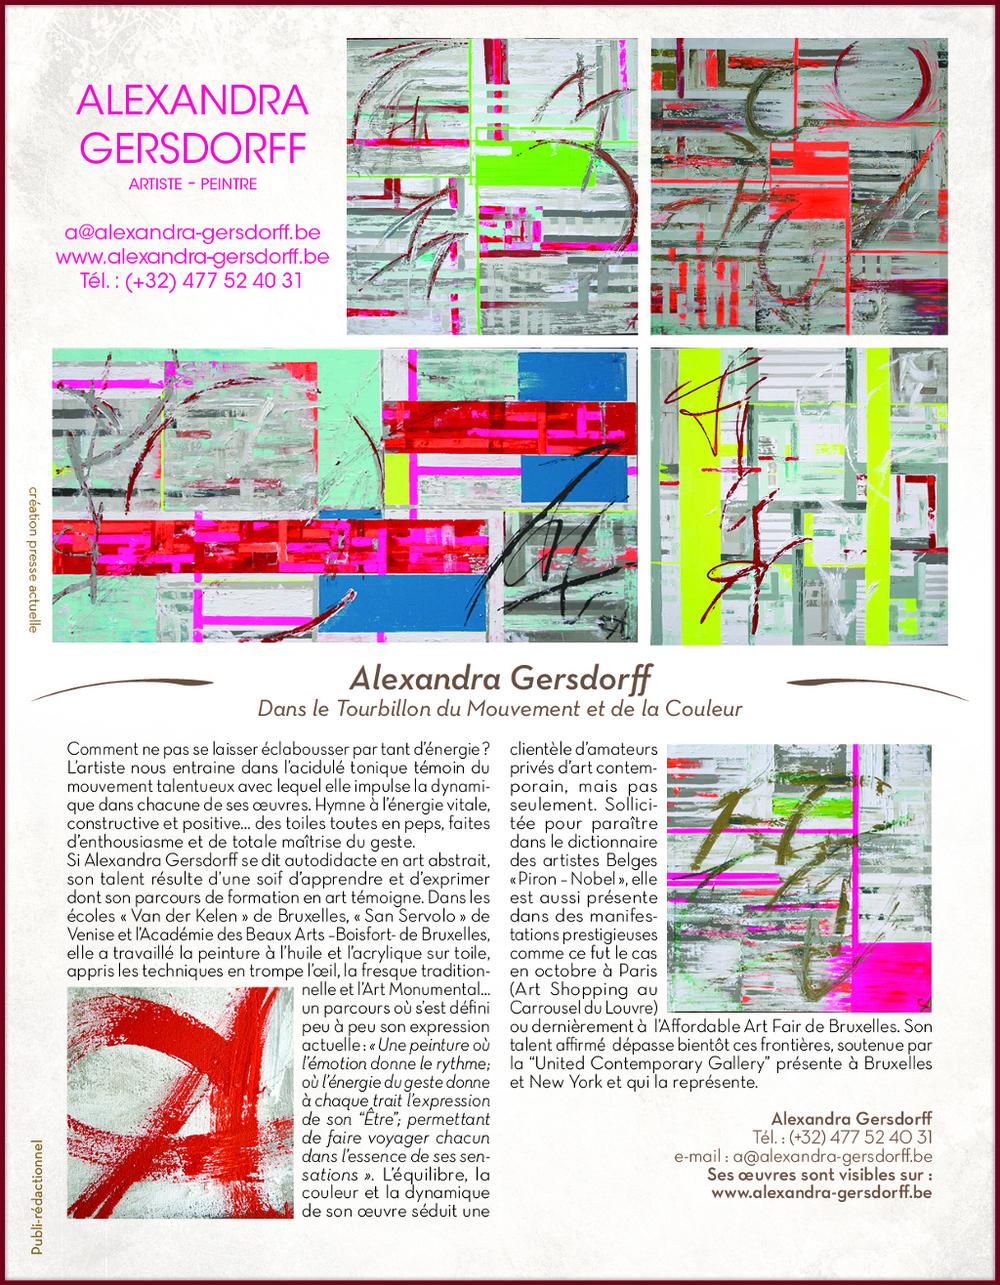 ContentImage-1395-11171-MePAlexandraGersdorff.jpg